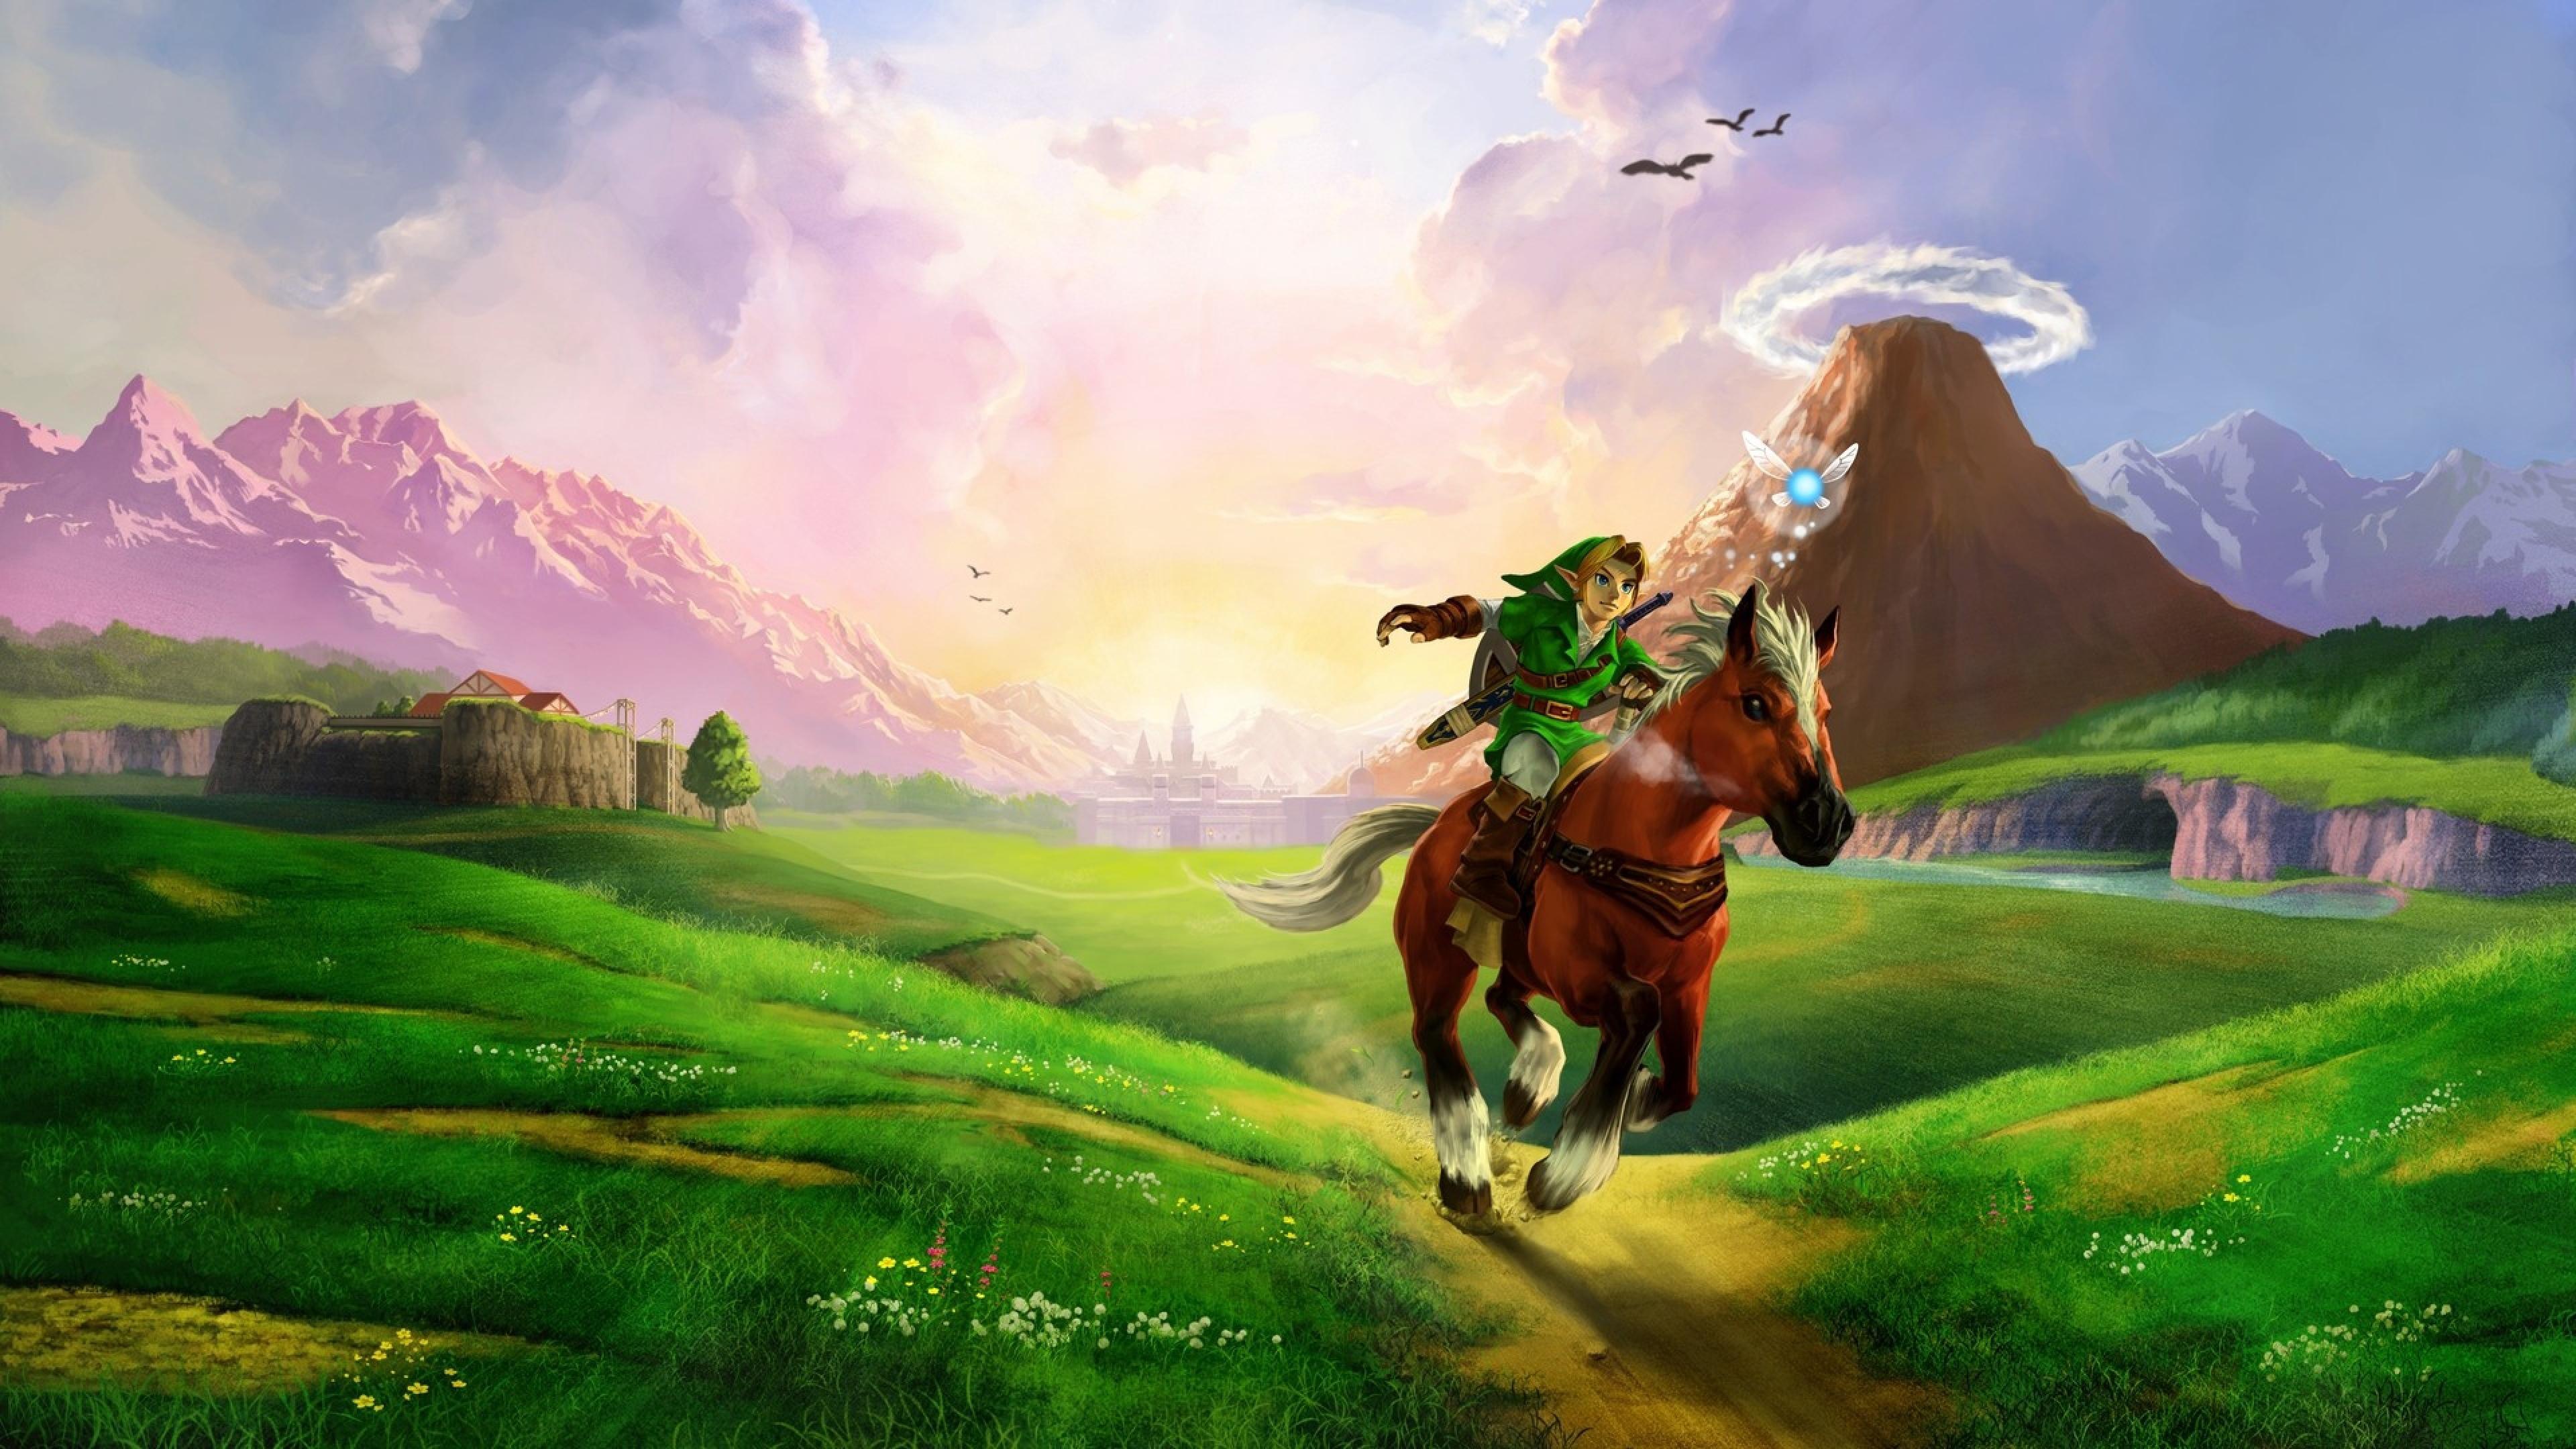 zelda Horse Plain River Sunlight Zelda 4K Ultra HD HD Background 3840x2160